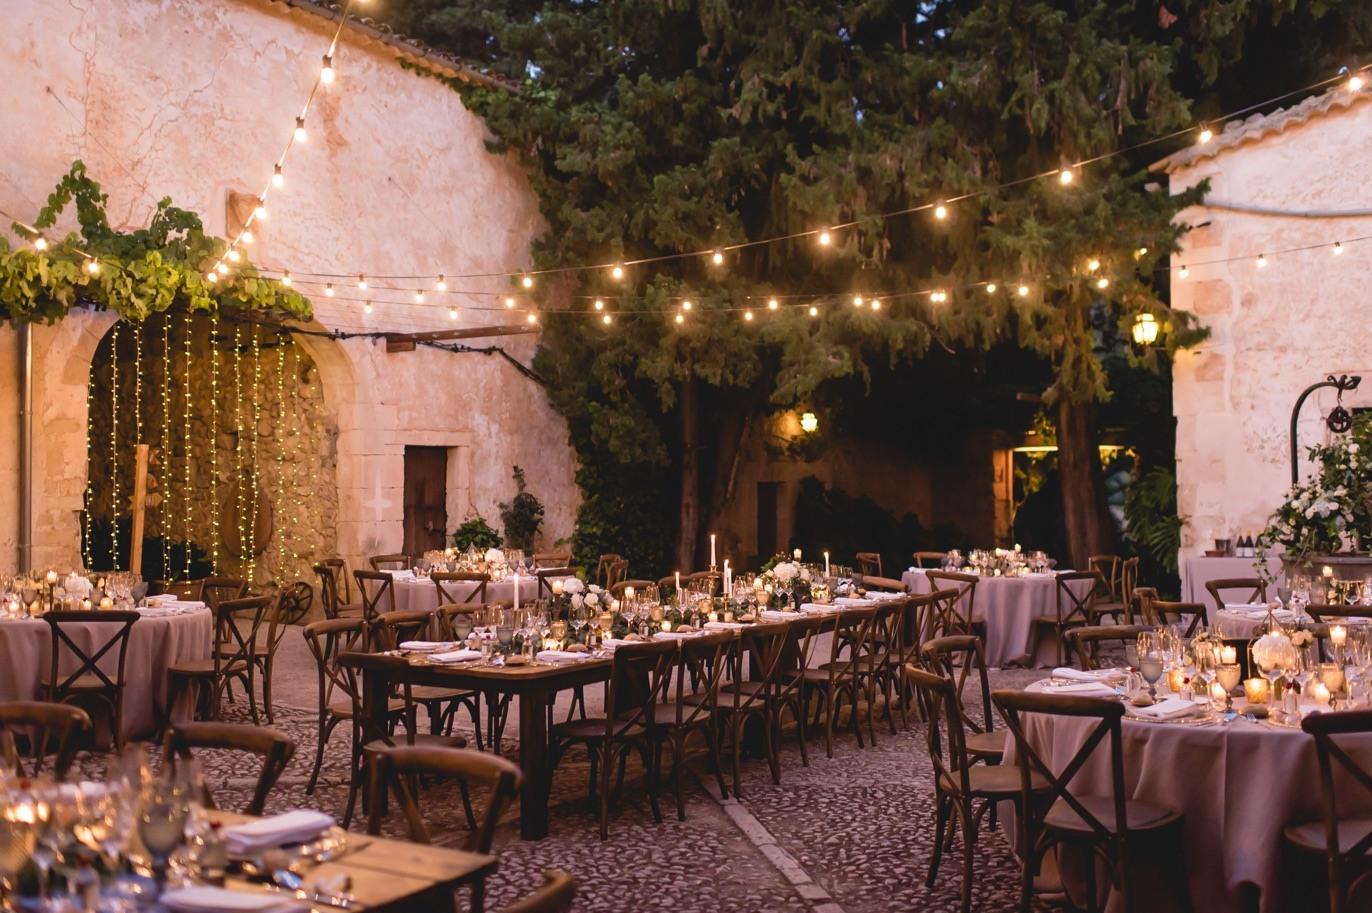 decoración banquete de bodas